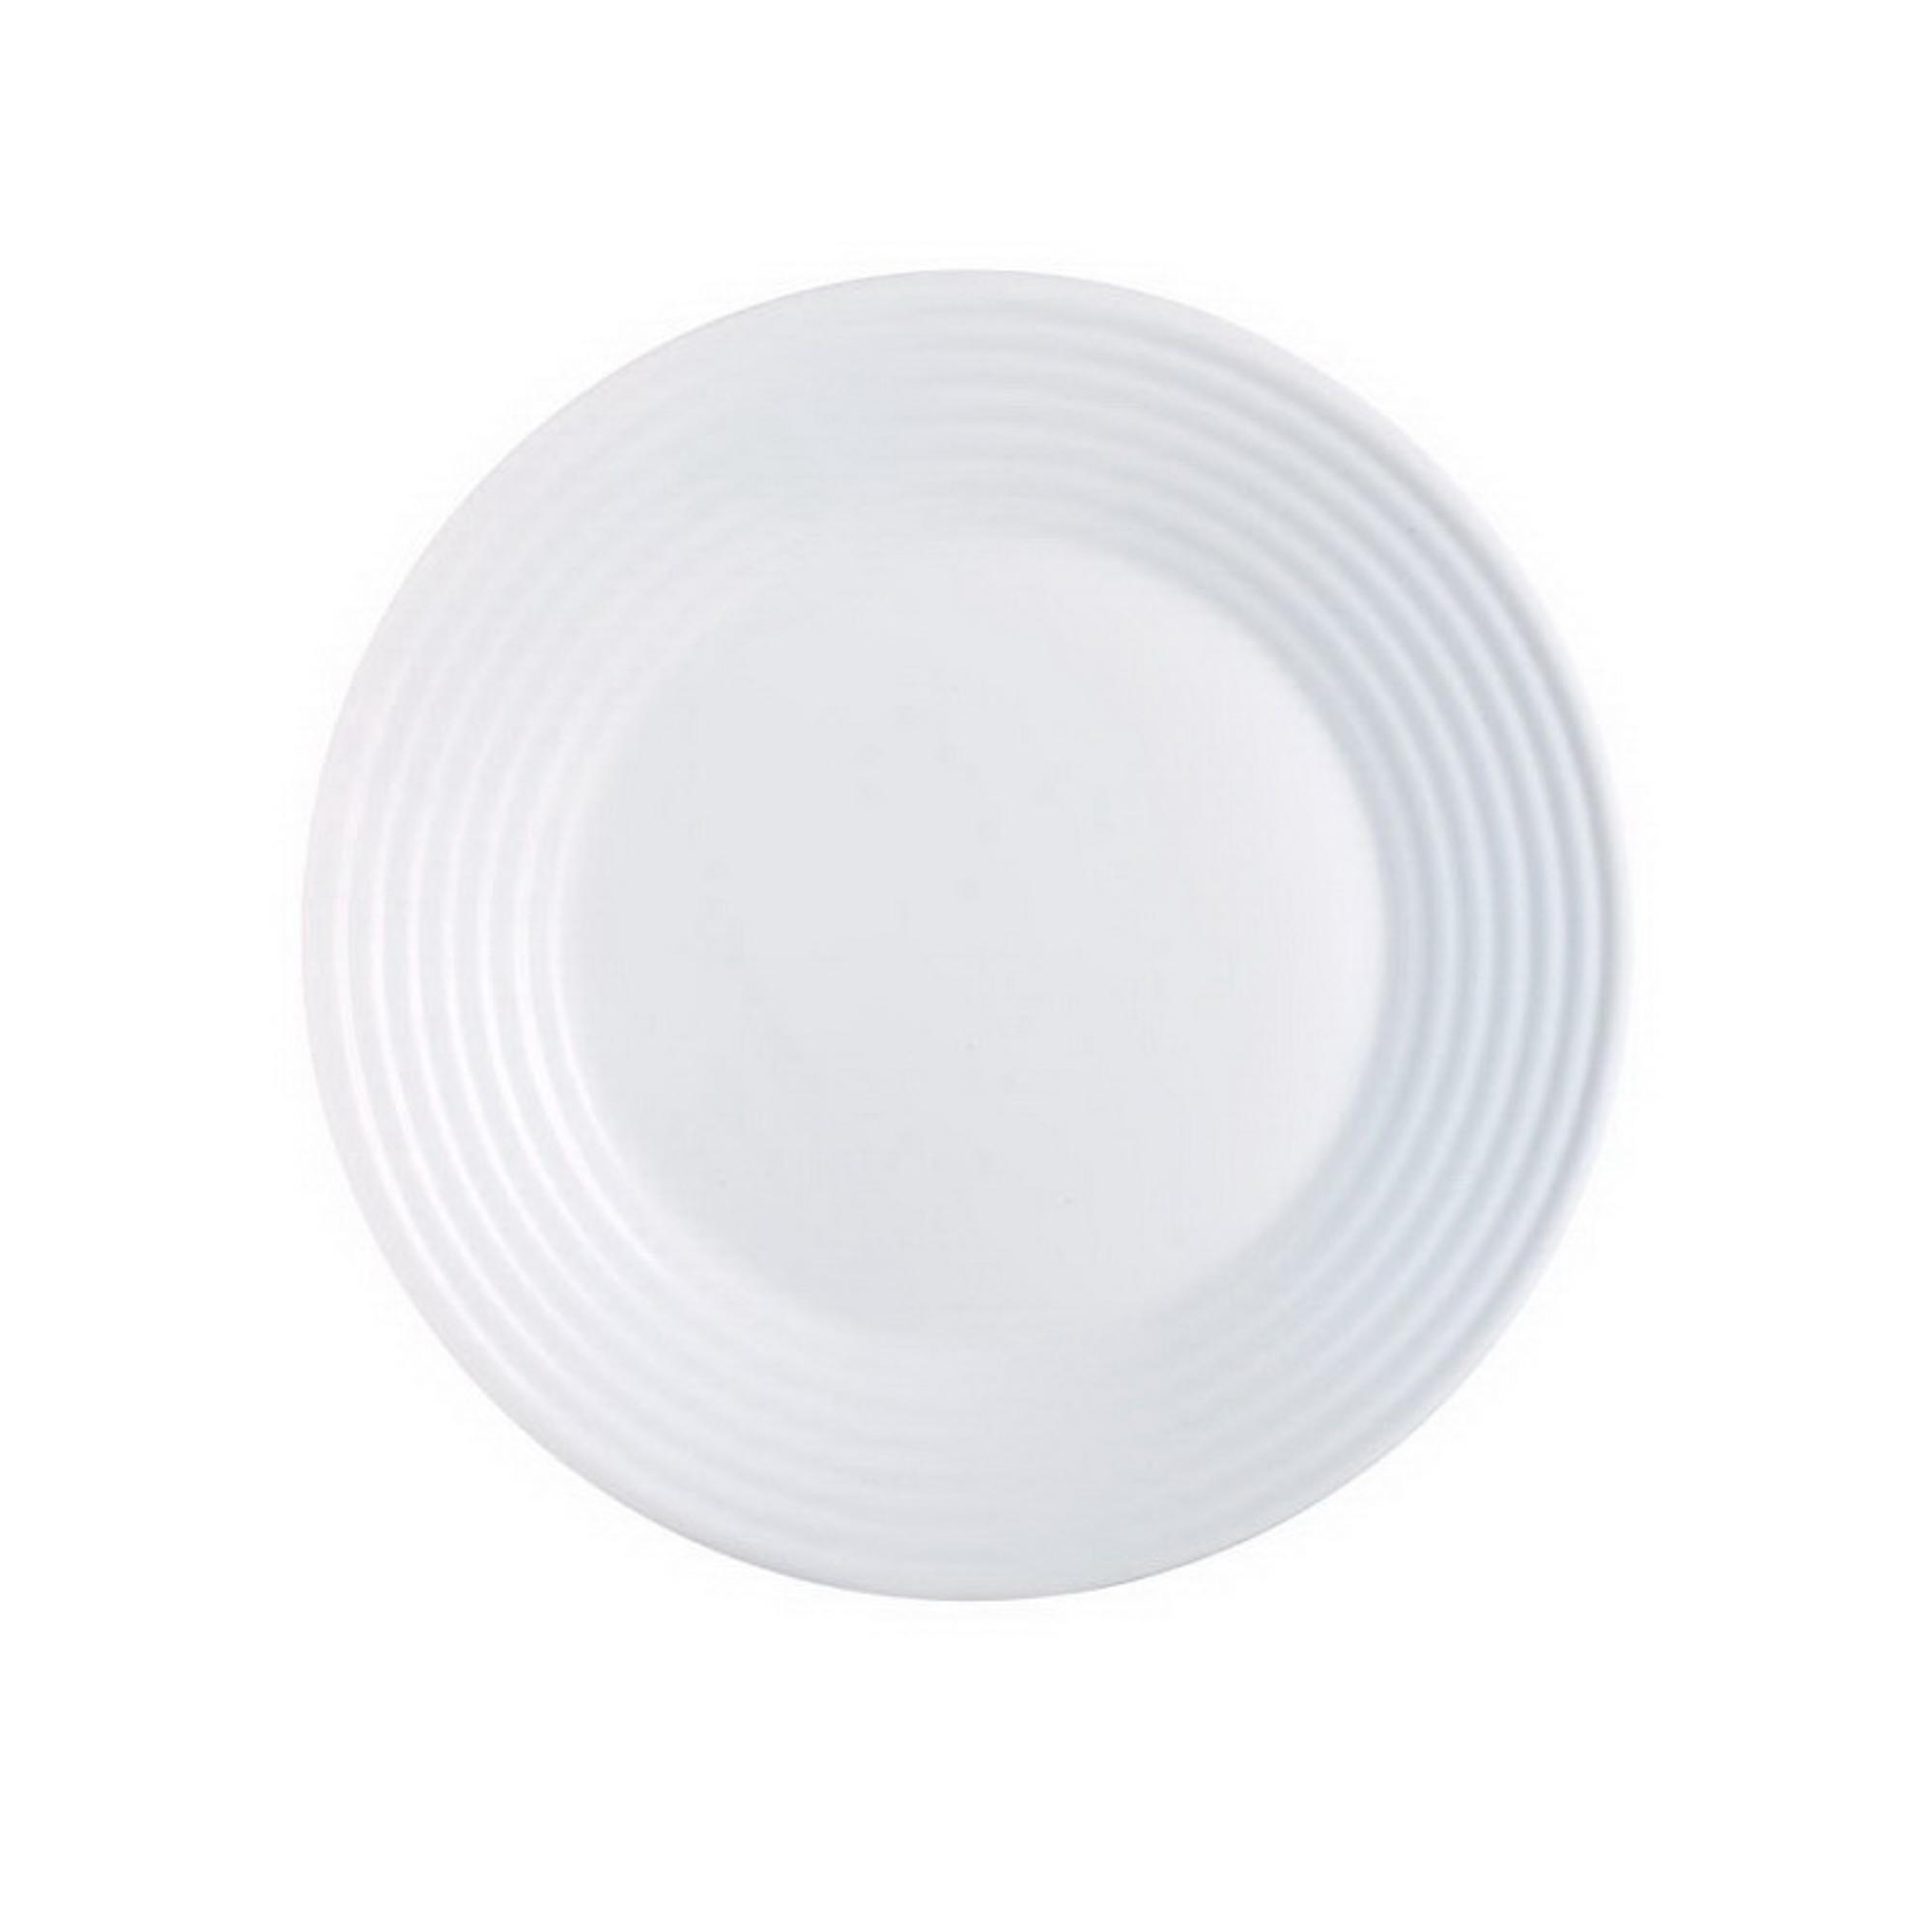 Тарелка обеденная Luminarc Gerbe 25 см luminarc тарелка обеденная armoise 25 см белый